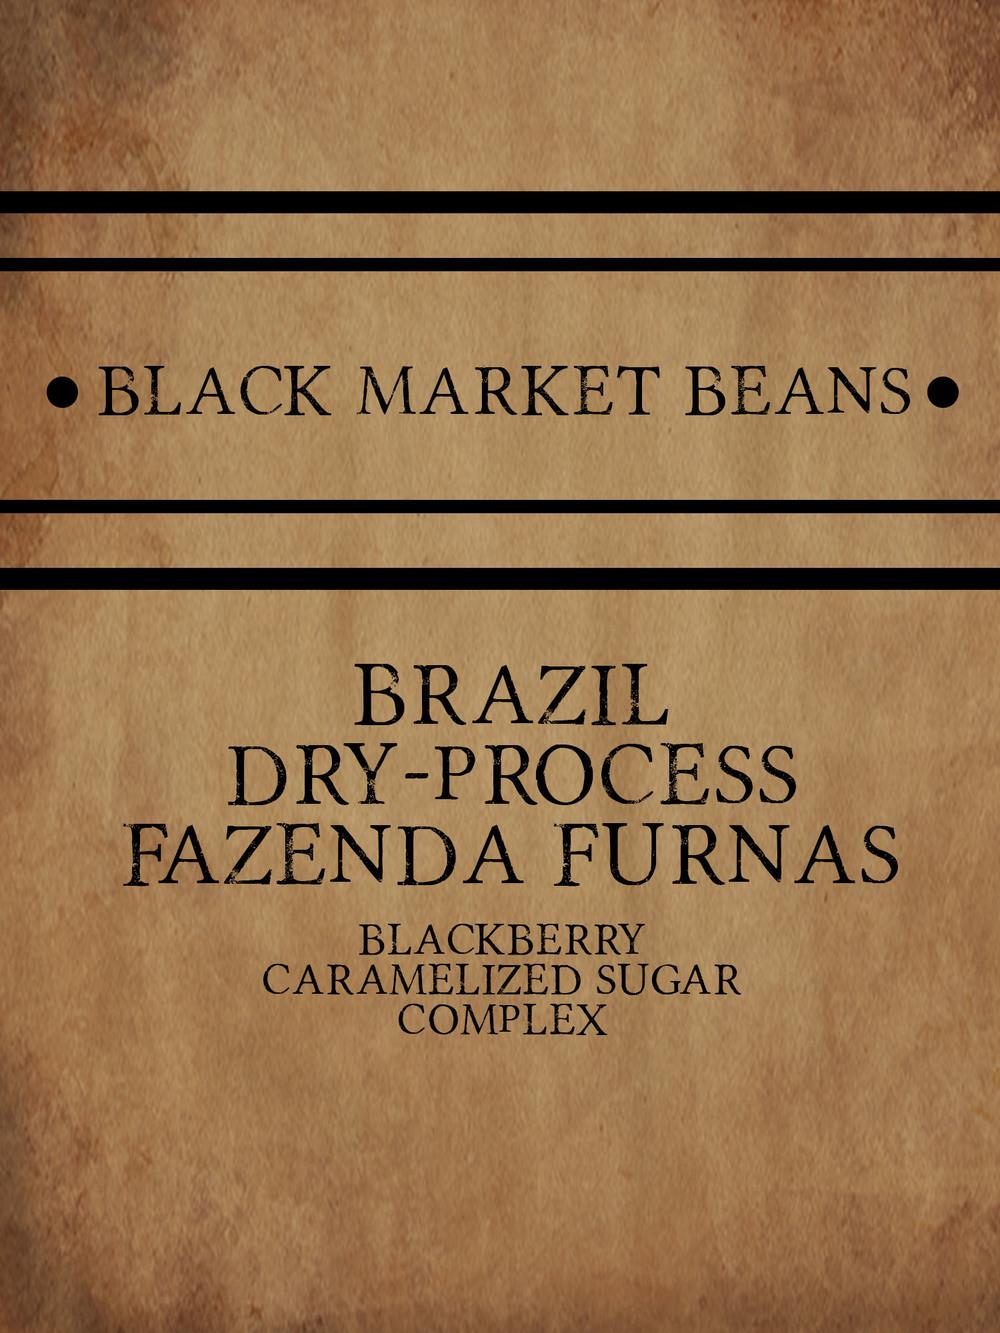 coffee_Brazil_Dry-Process_Fazenda_Furnas.jpg